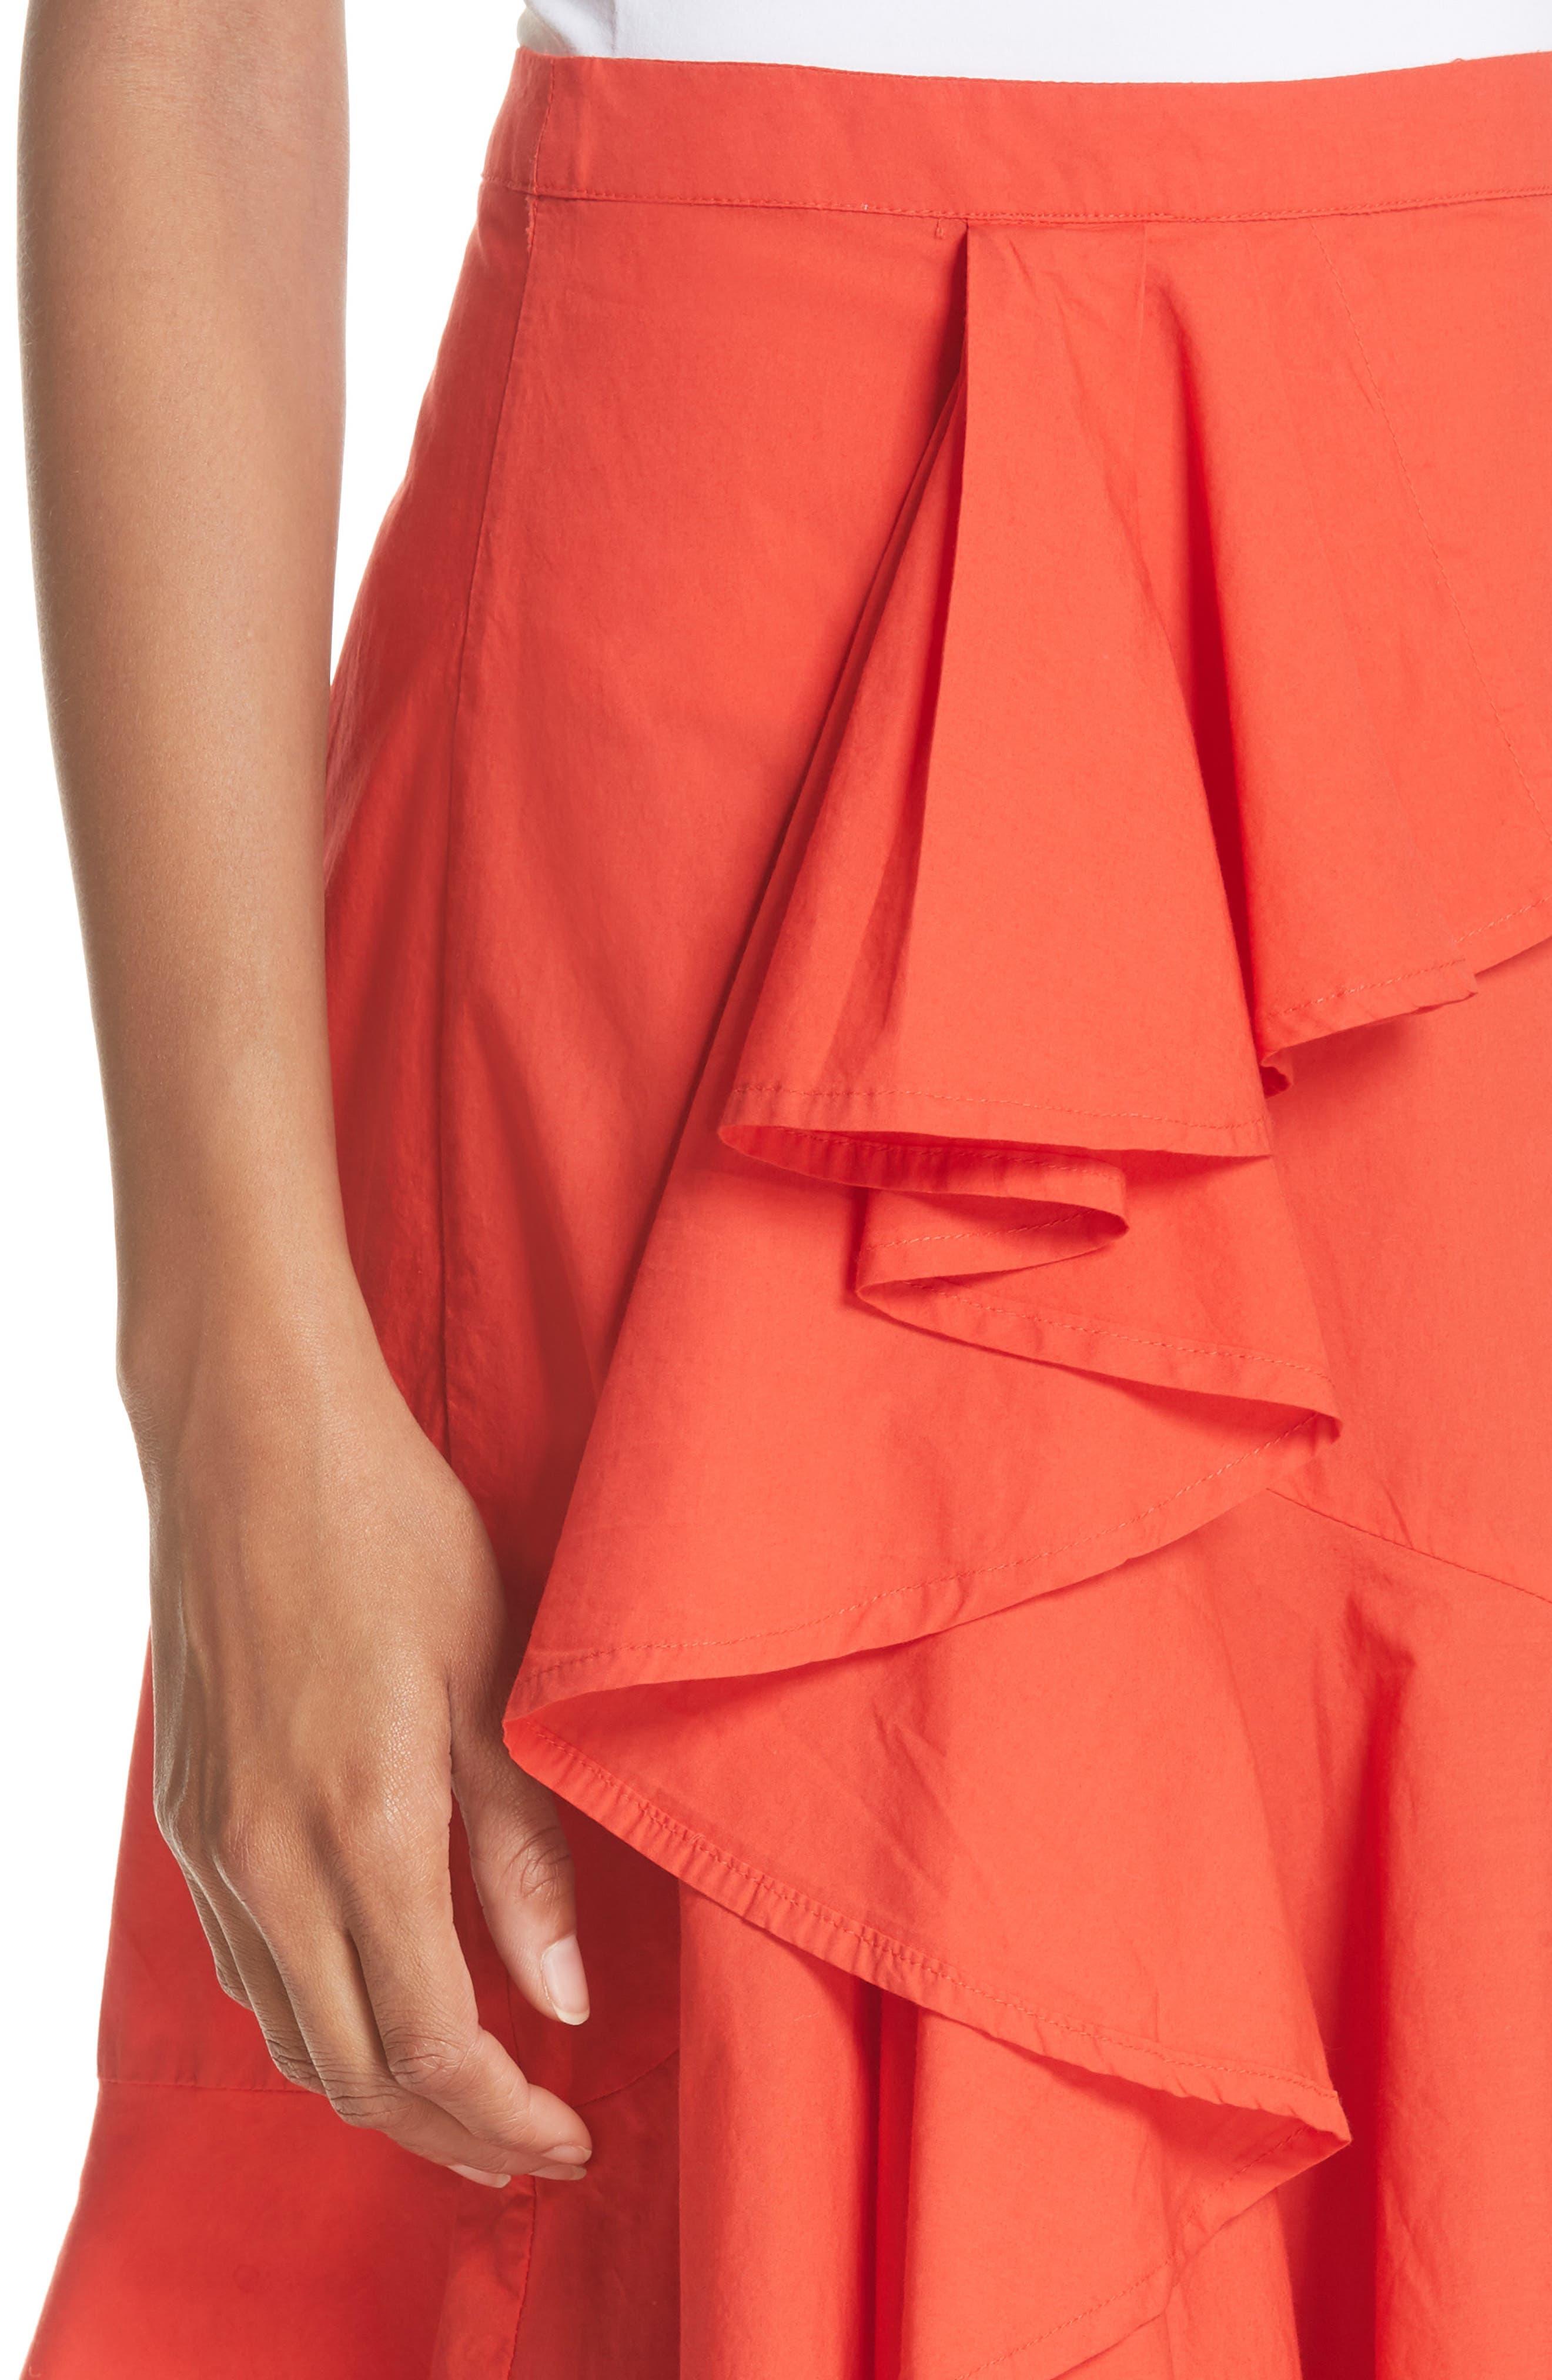 Chesmu Ruffled Cotton Skirt,                             Alternate thumbnail 4, color,                             Salsa